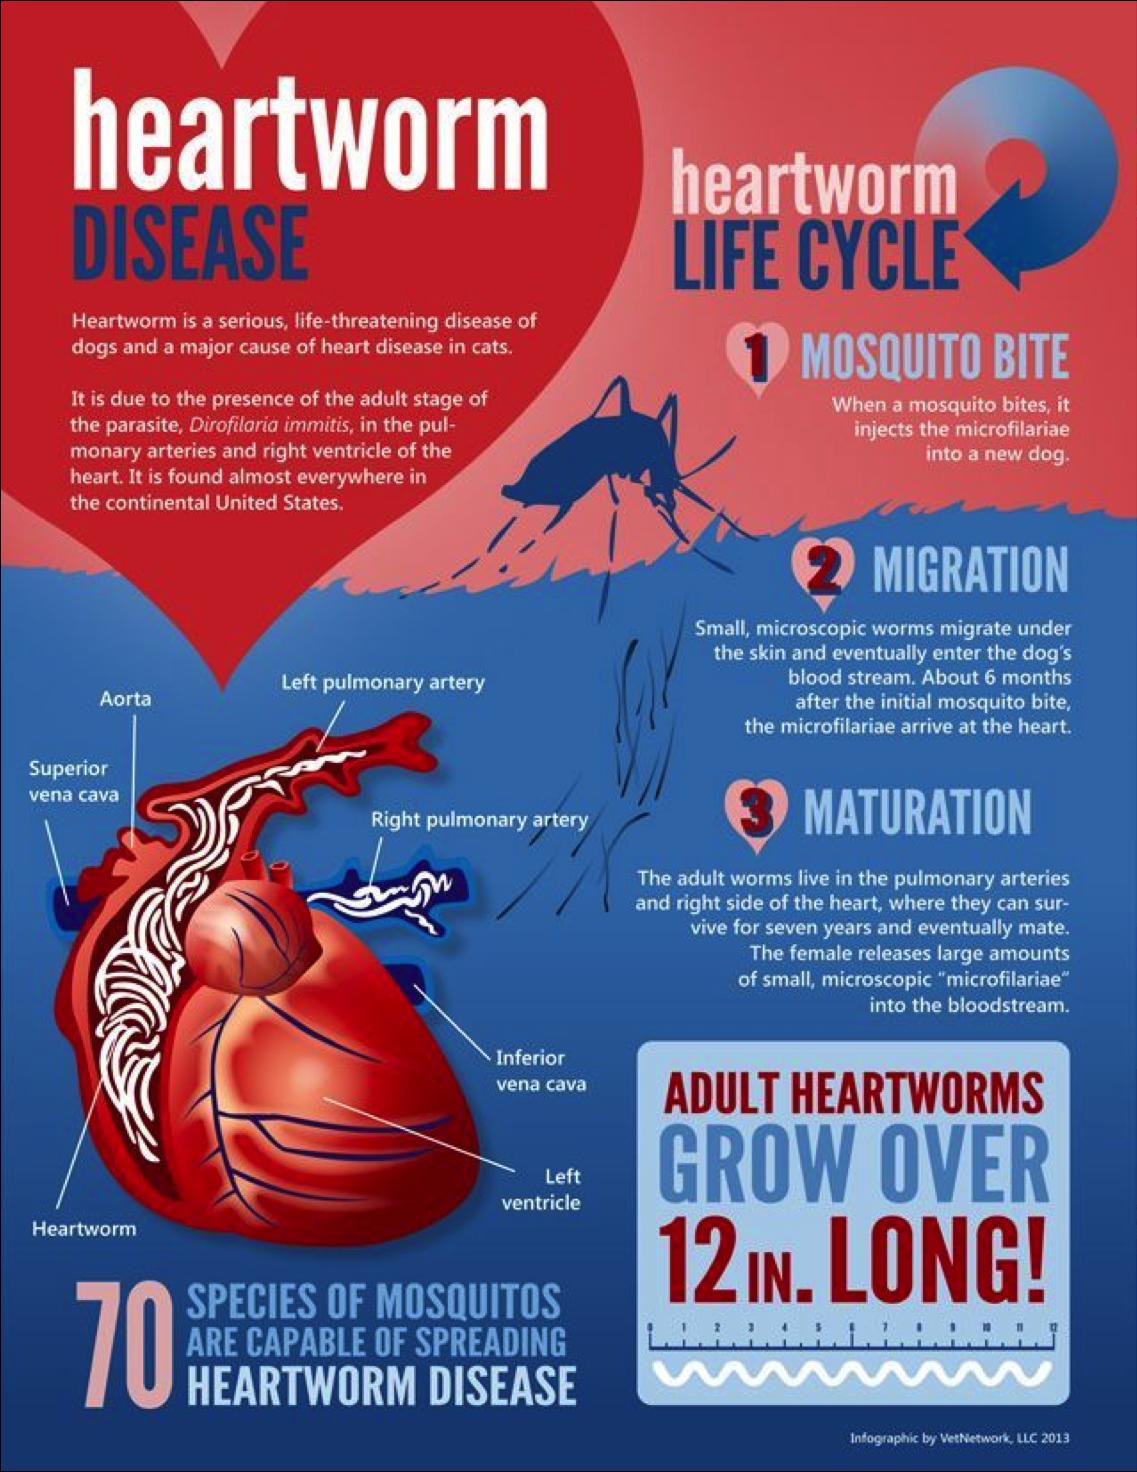 heartwormdisease.png